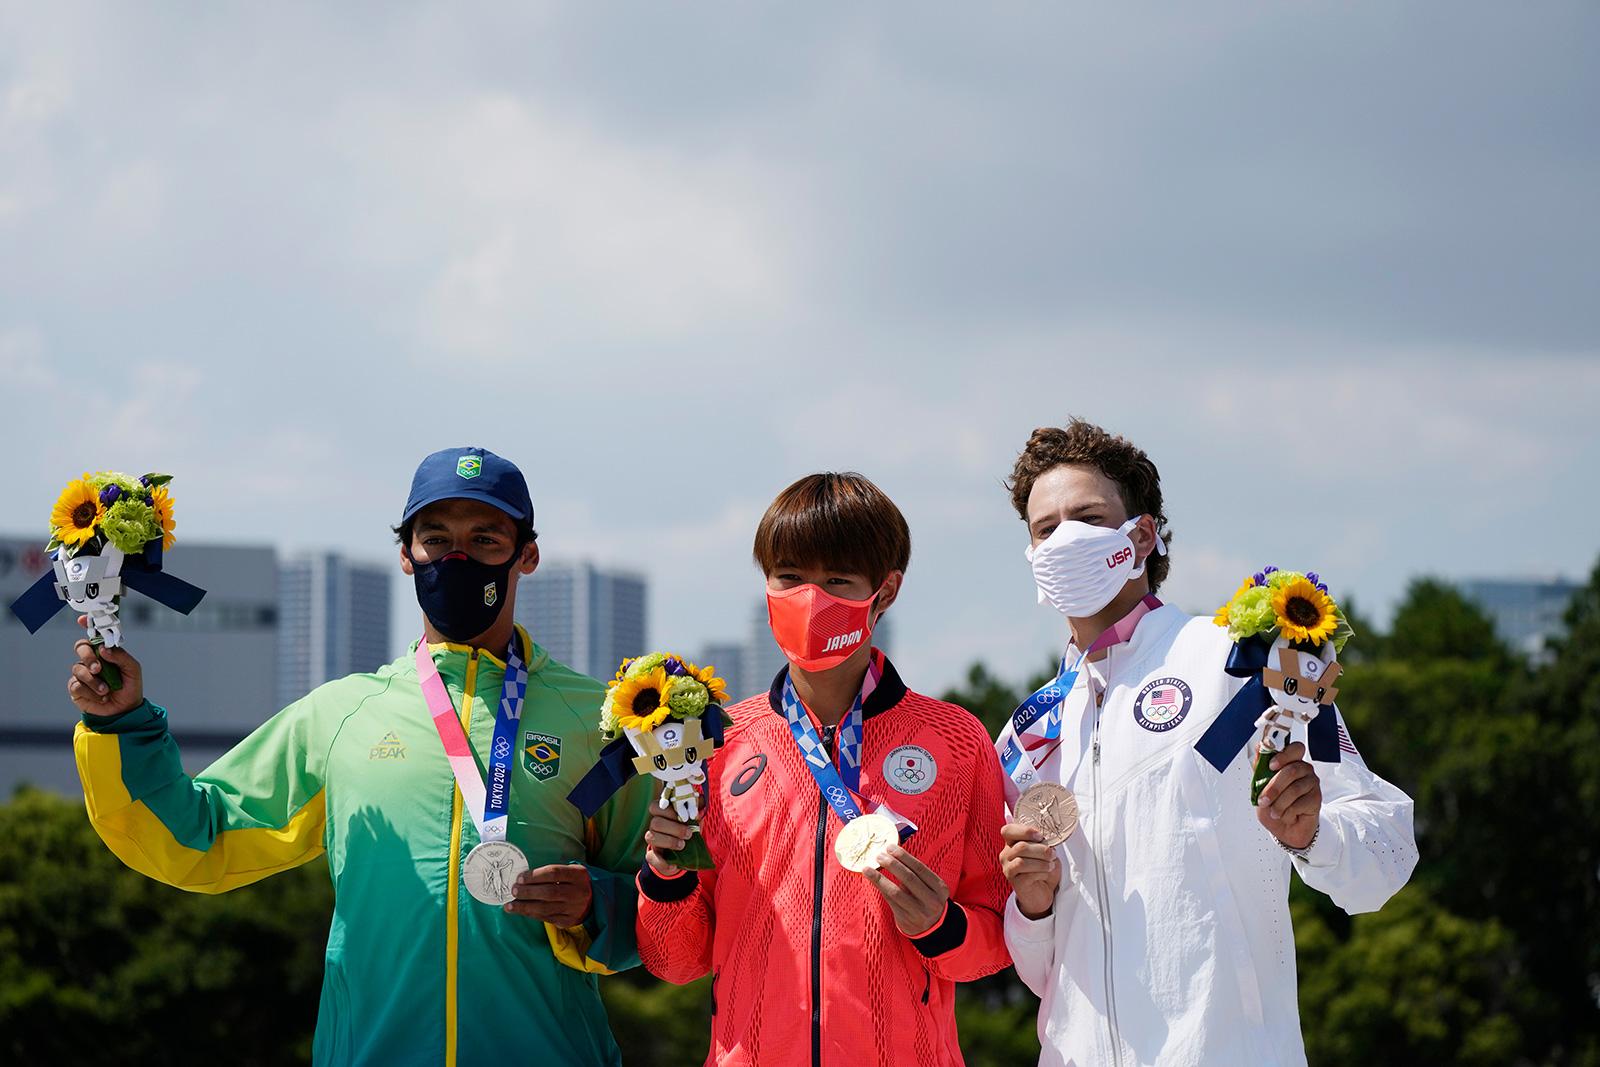 Kelvin Hoefler of Brazil, Yuto Horigome of Japan and Jagger Eton pose after the medal presentation at the men's street skateboarding finals on Sunday, July 25.